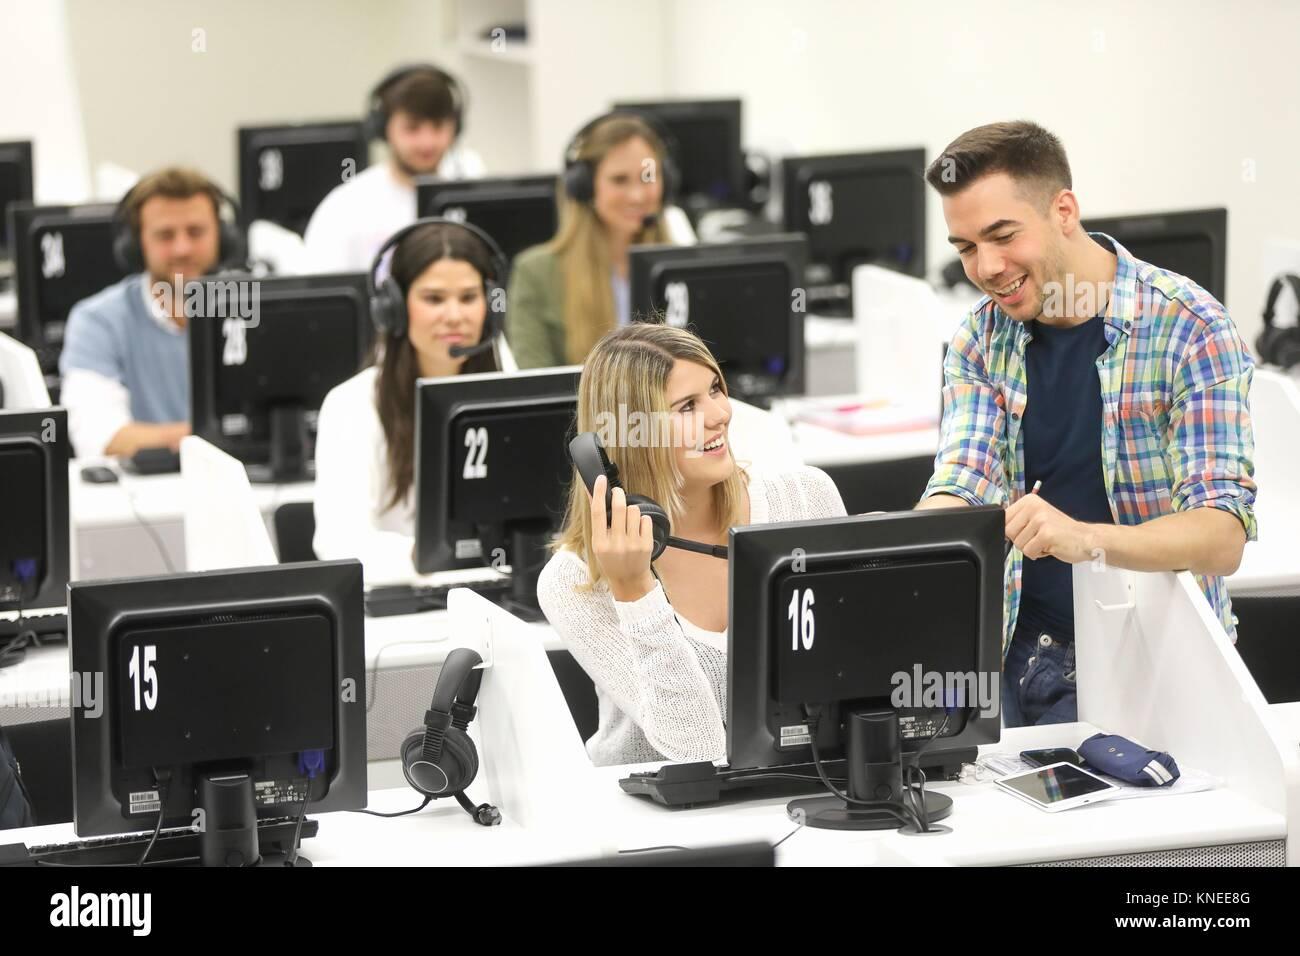 Studenten im Sprachlabor, Sprache, Schulungsraum, Universität des Baskenlandes, Donostia, San Sebastian, Gipuzkoa, Stockbild